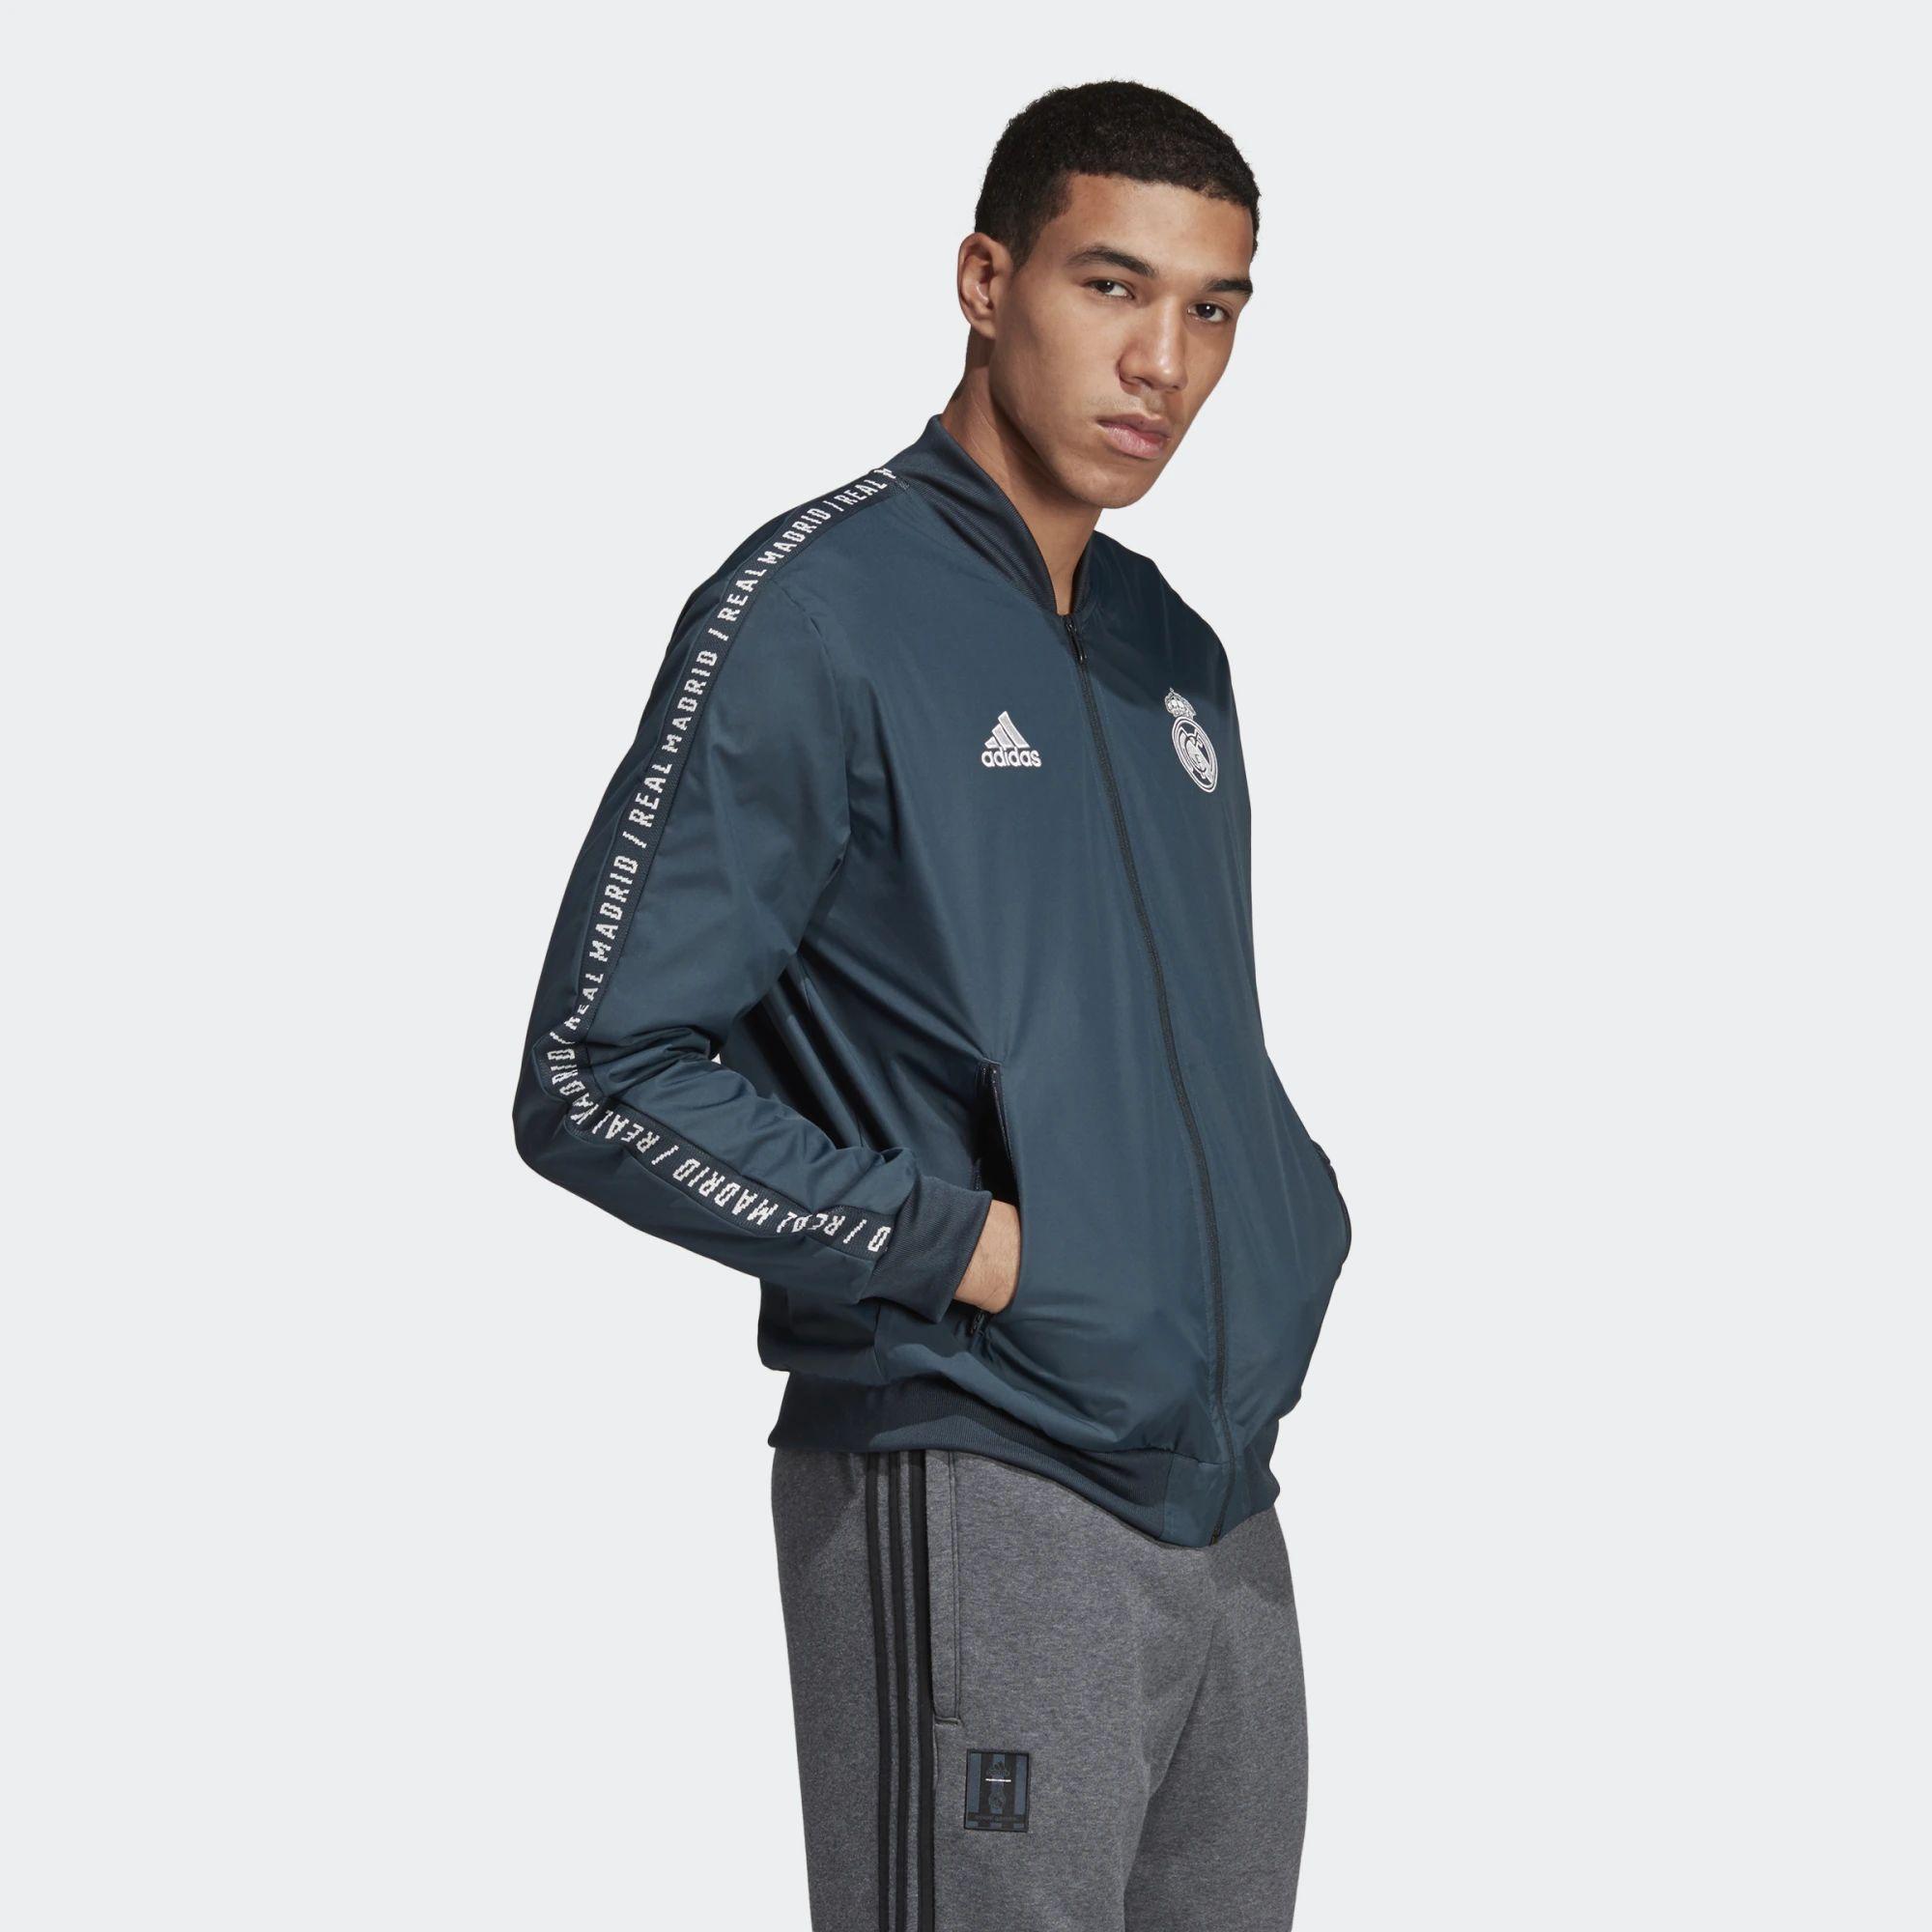 73ef96b39 ... Click to enlarge image adidas_real_madrid_anthem_jacket_tech_onix_f.jpg  ...